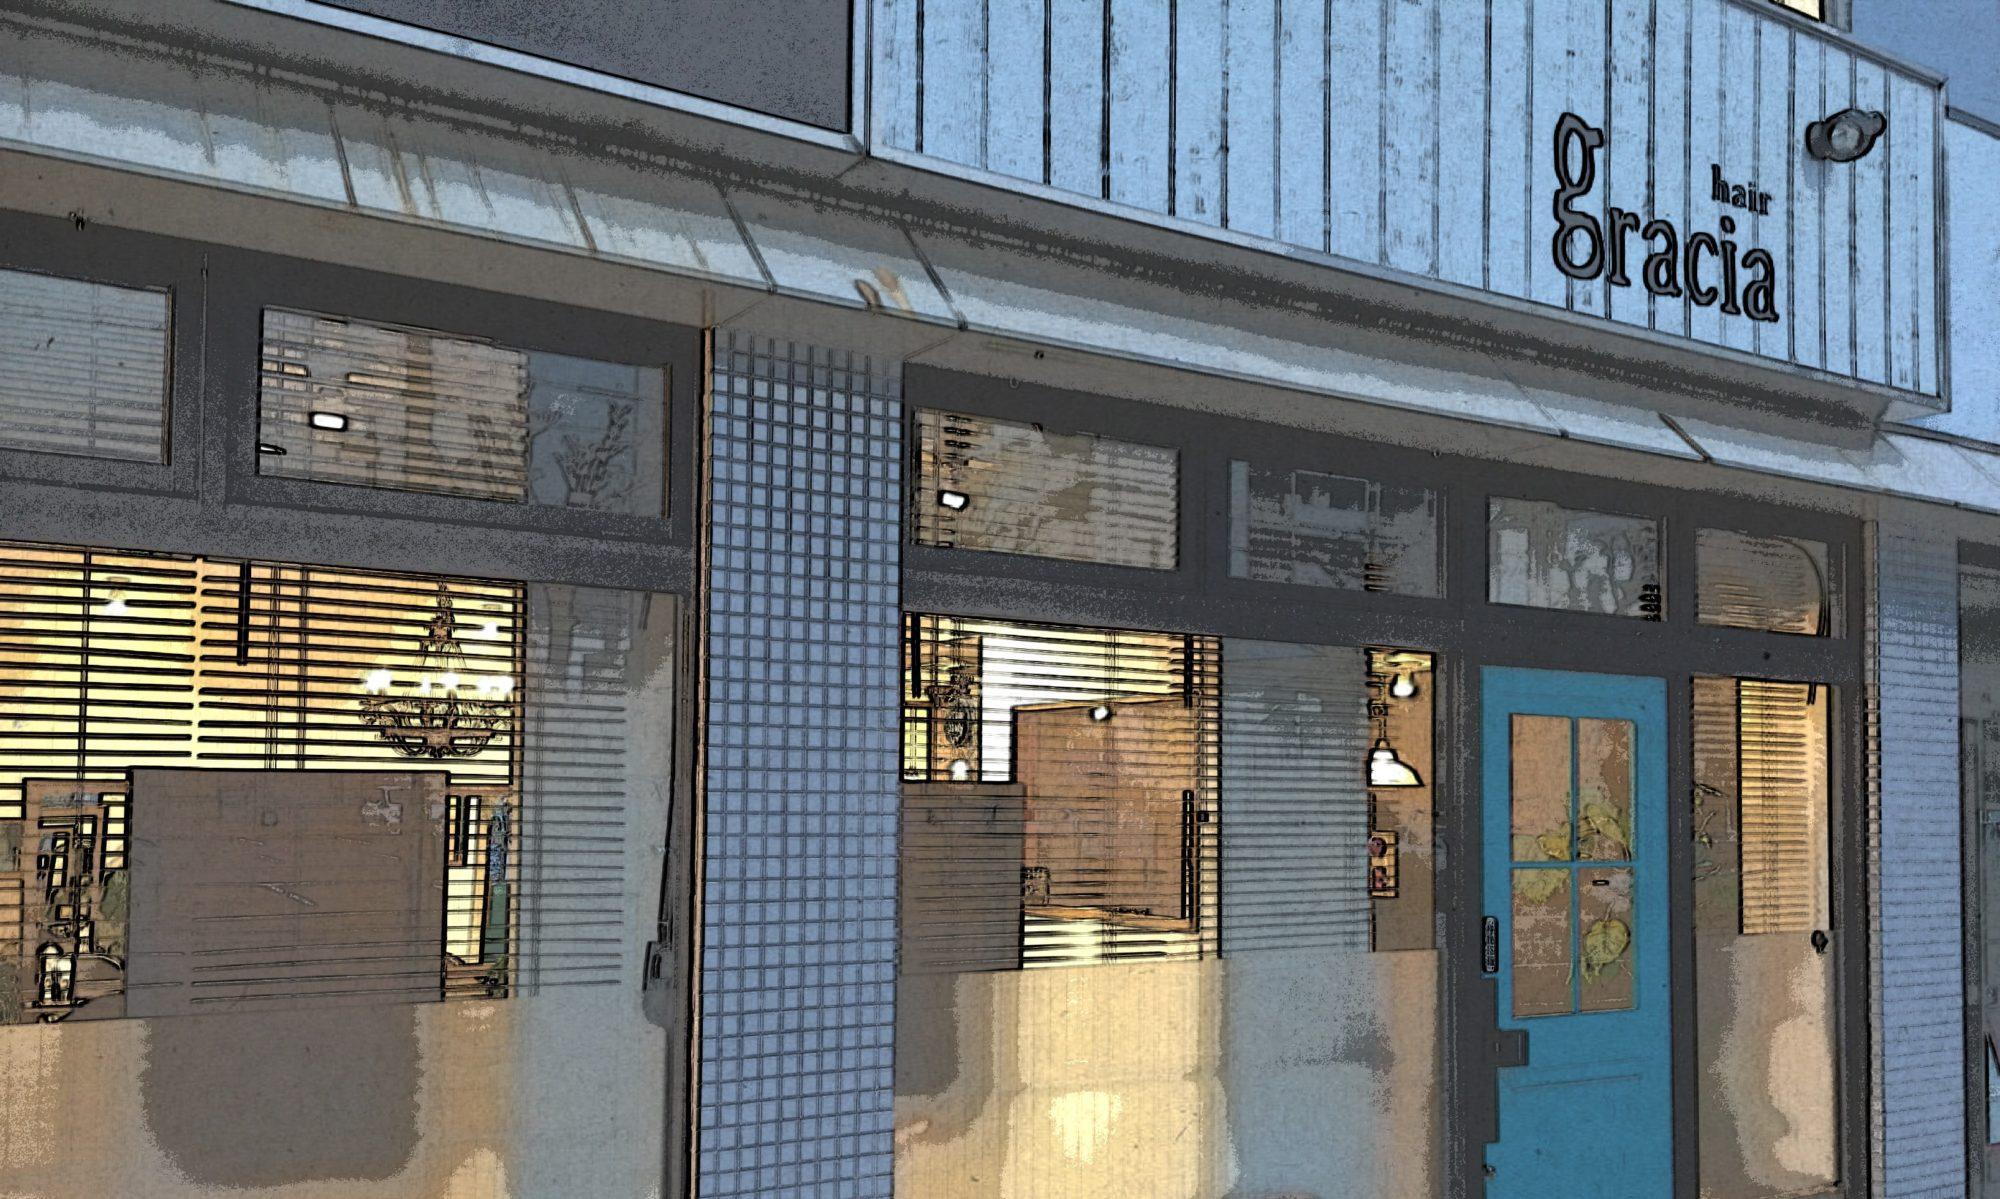 gracia(グラシア)四日市|美容院・美容室|